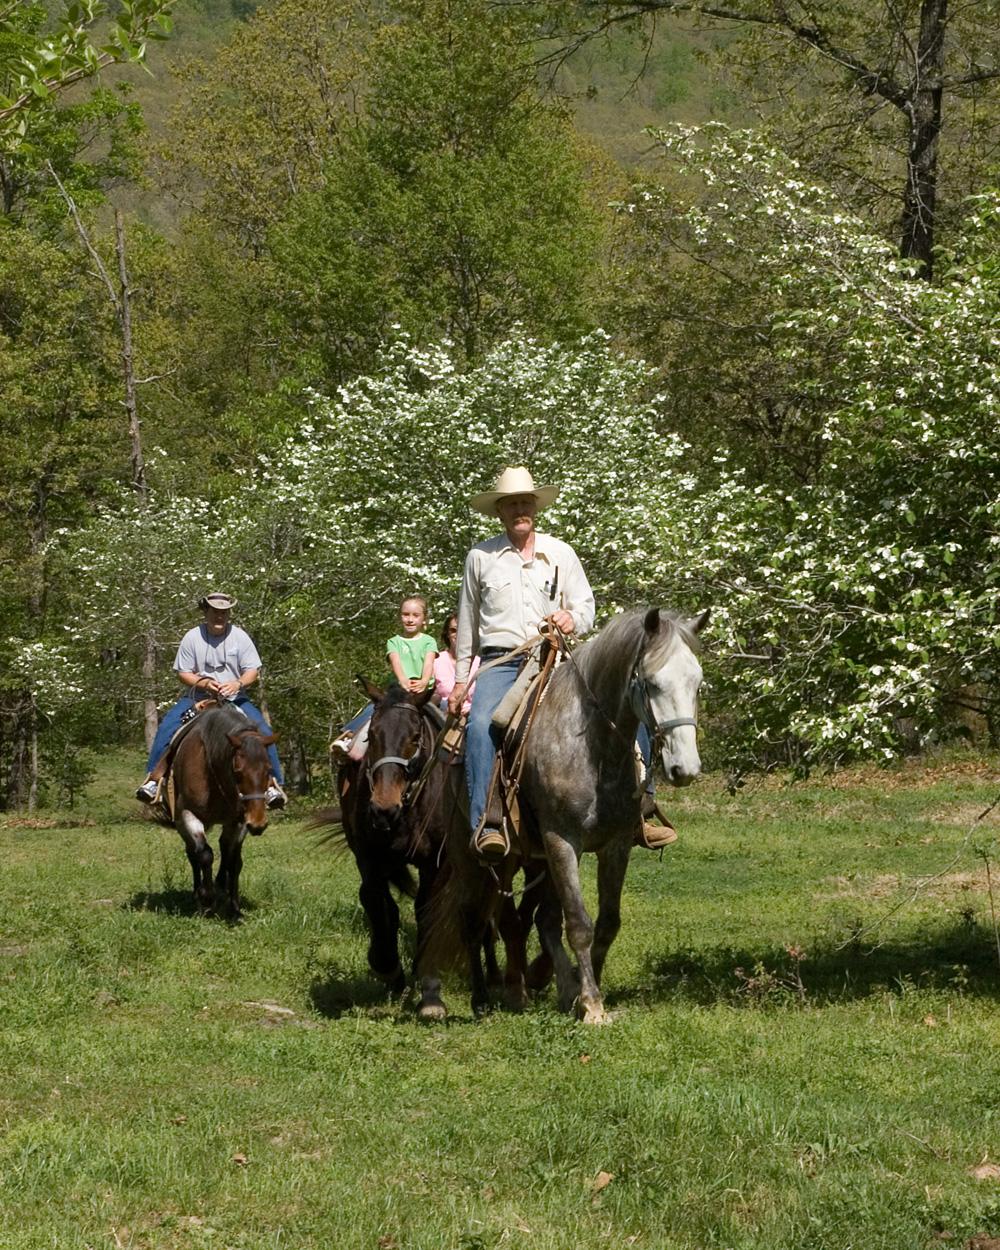 Horseback Riding at Rimrock Cove Ranch in the Spring